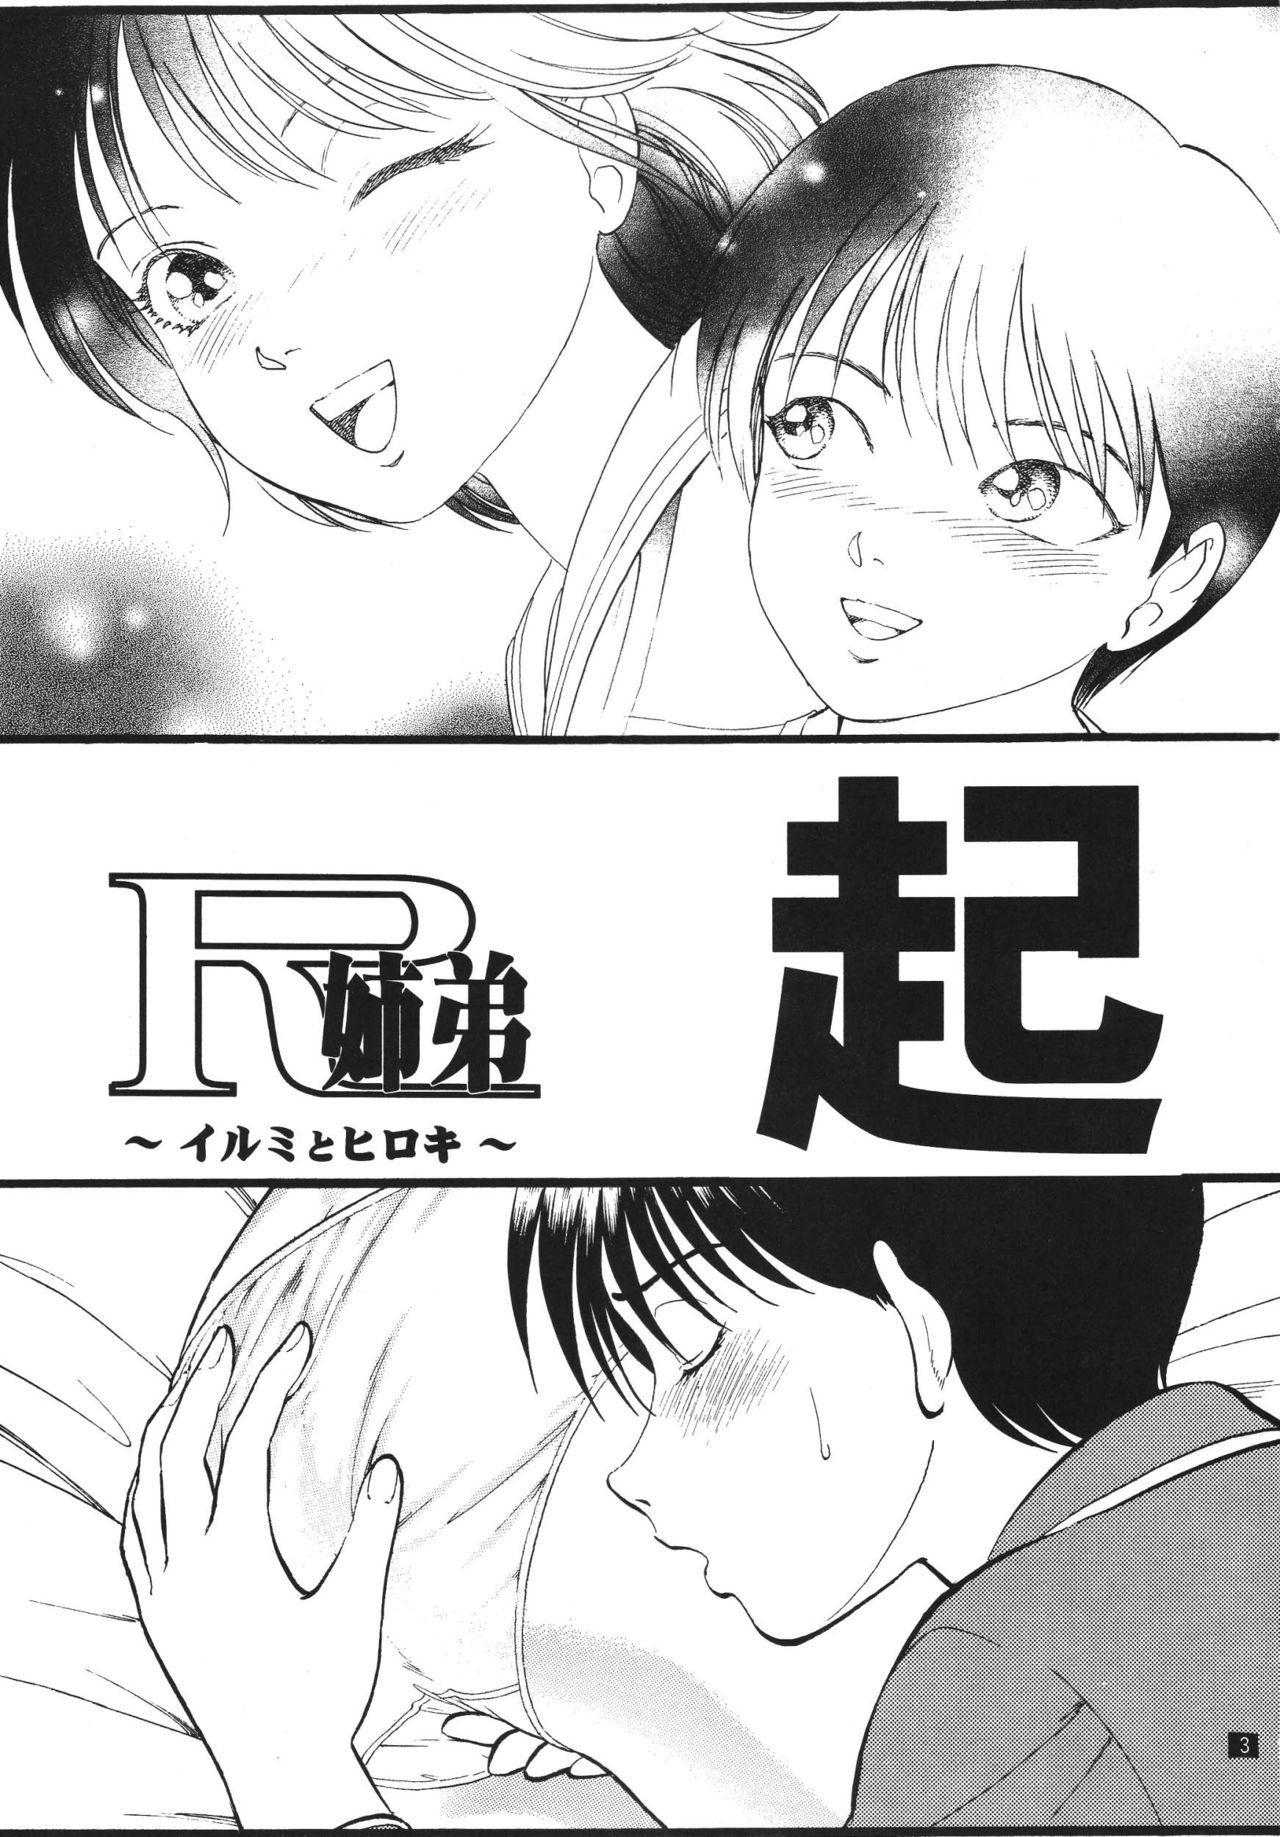 [RPG Company 2 (Yoriu Mushi)] R-Shitei Play 1 - Little Night Crawling [English] 1